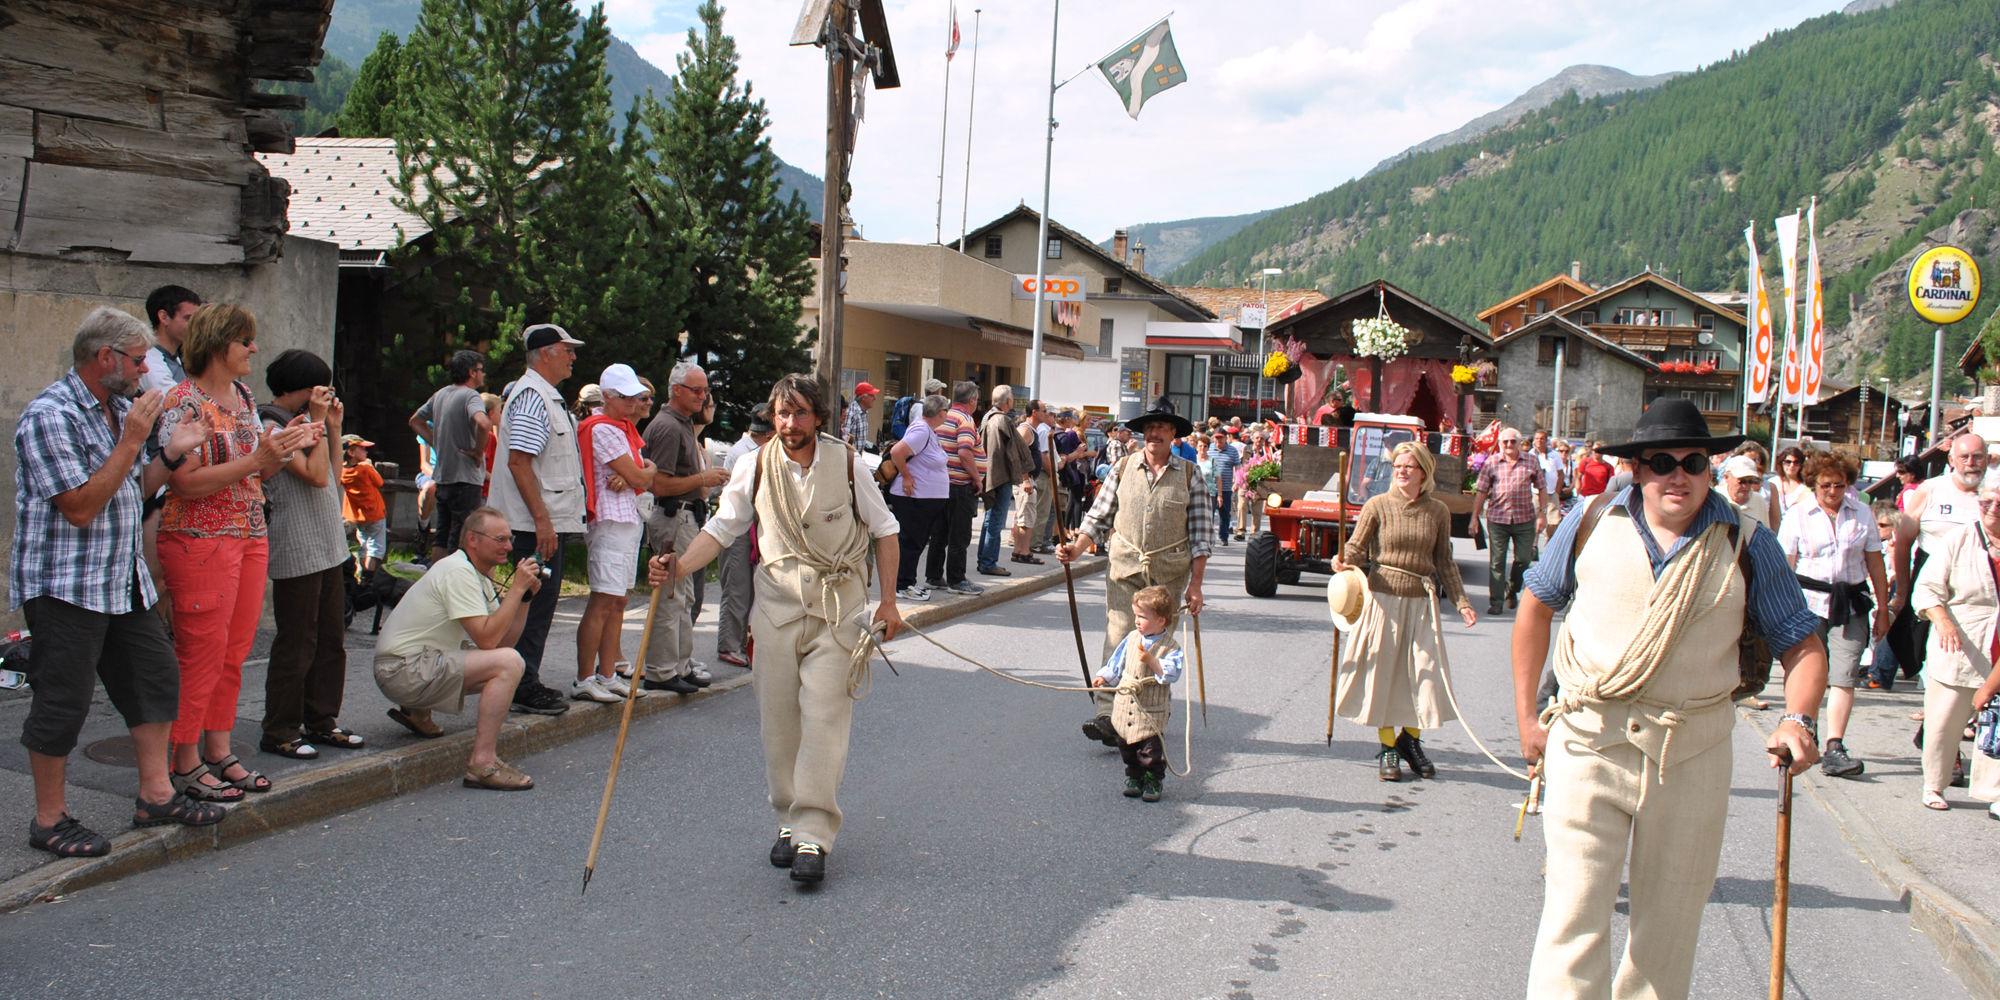 1. August Feier in der Freien Ferienrepublik Saas-Fee